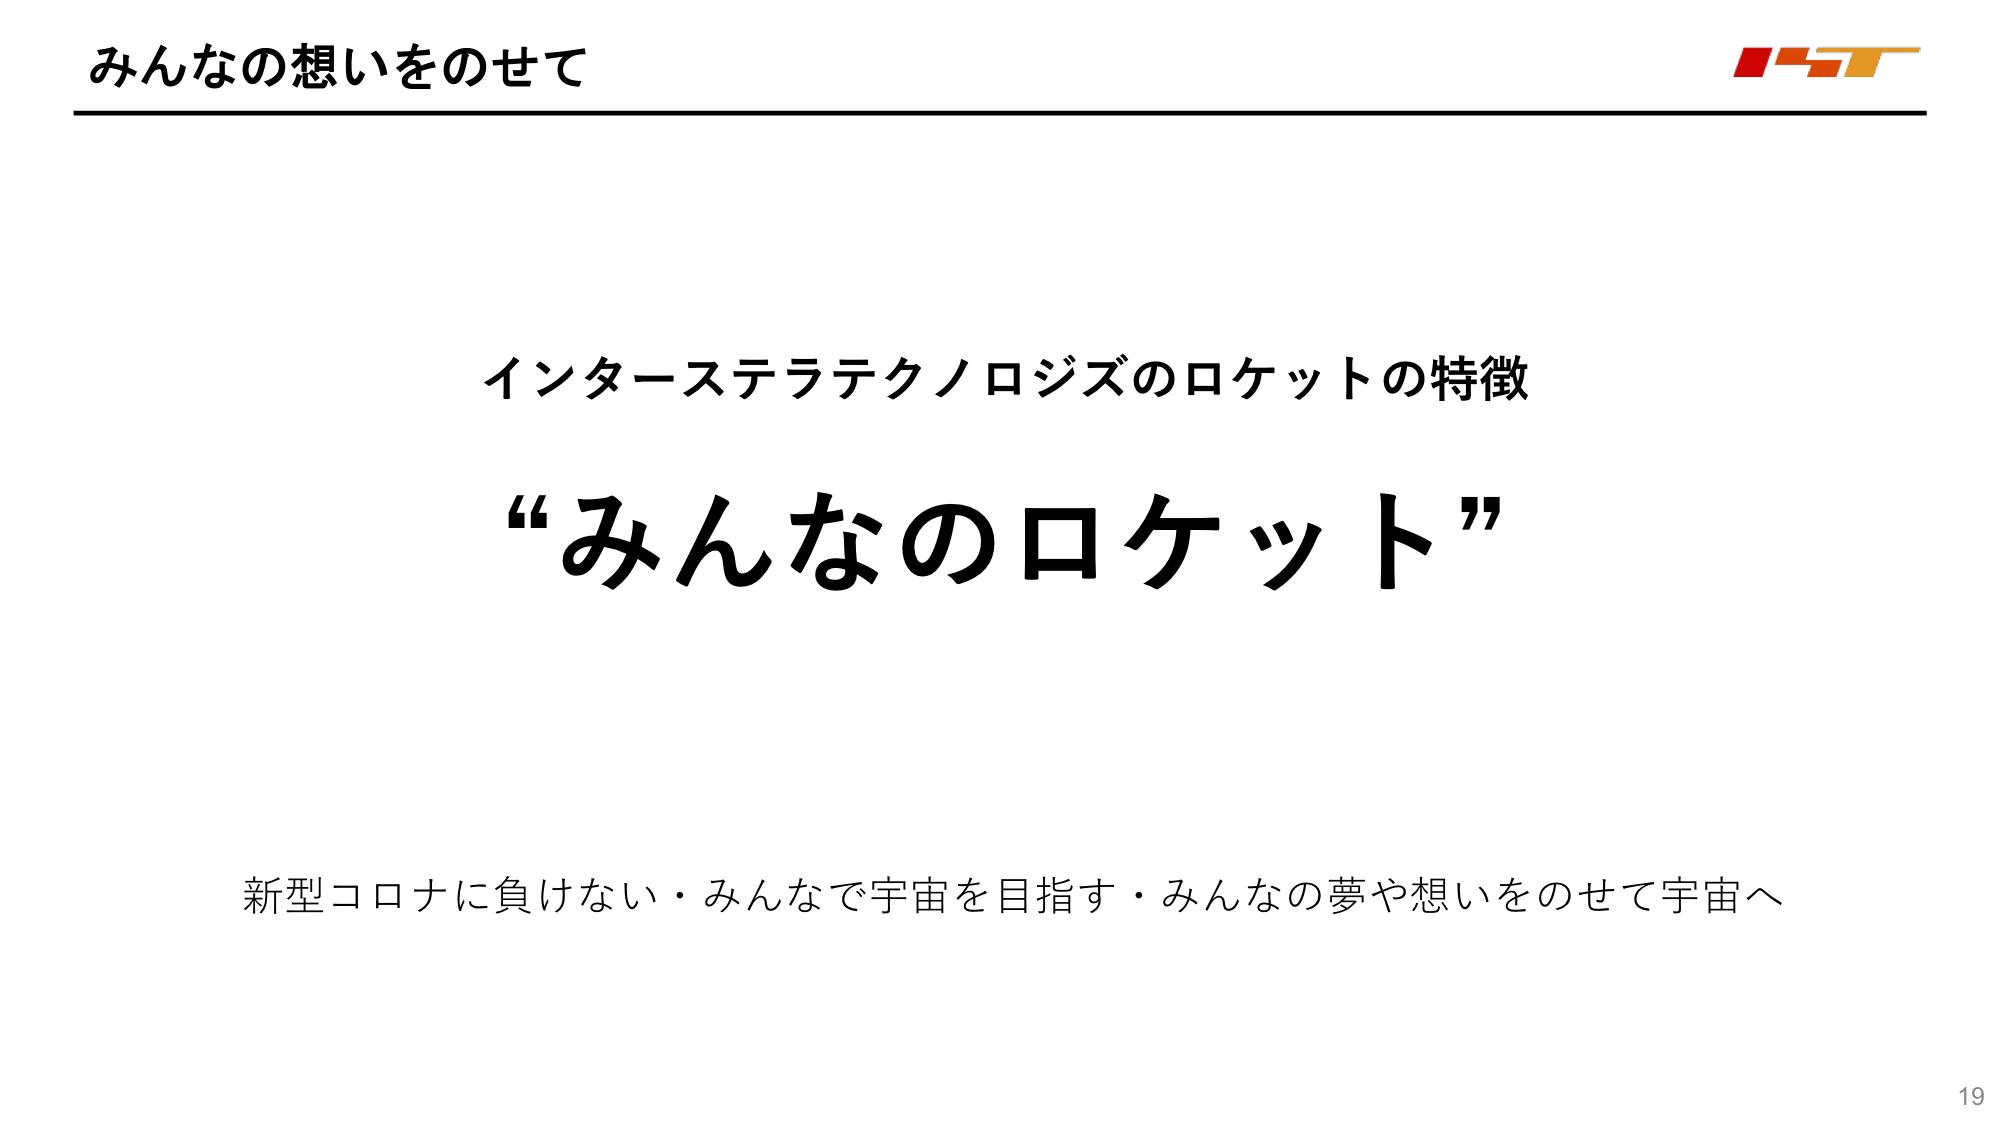 f:id:Imamura:20200603232902p:plain